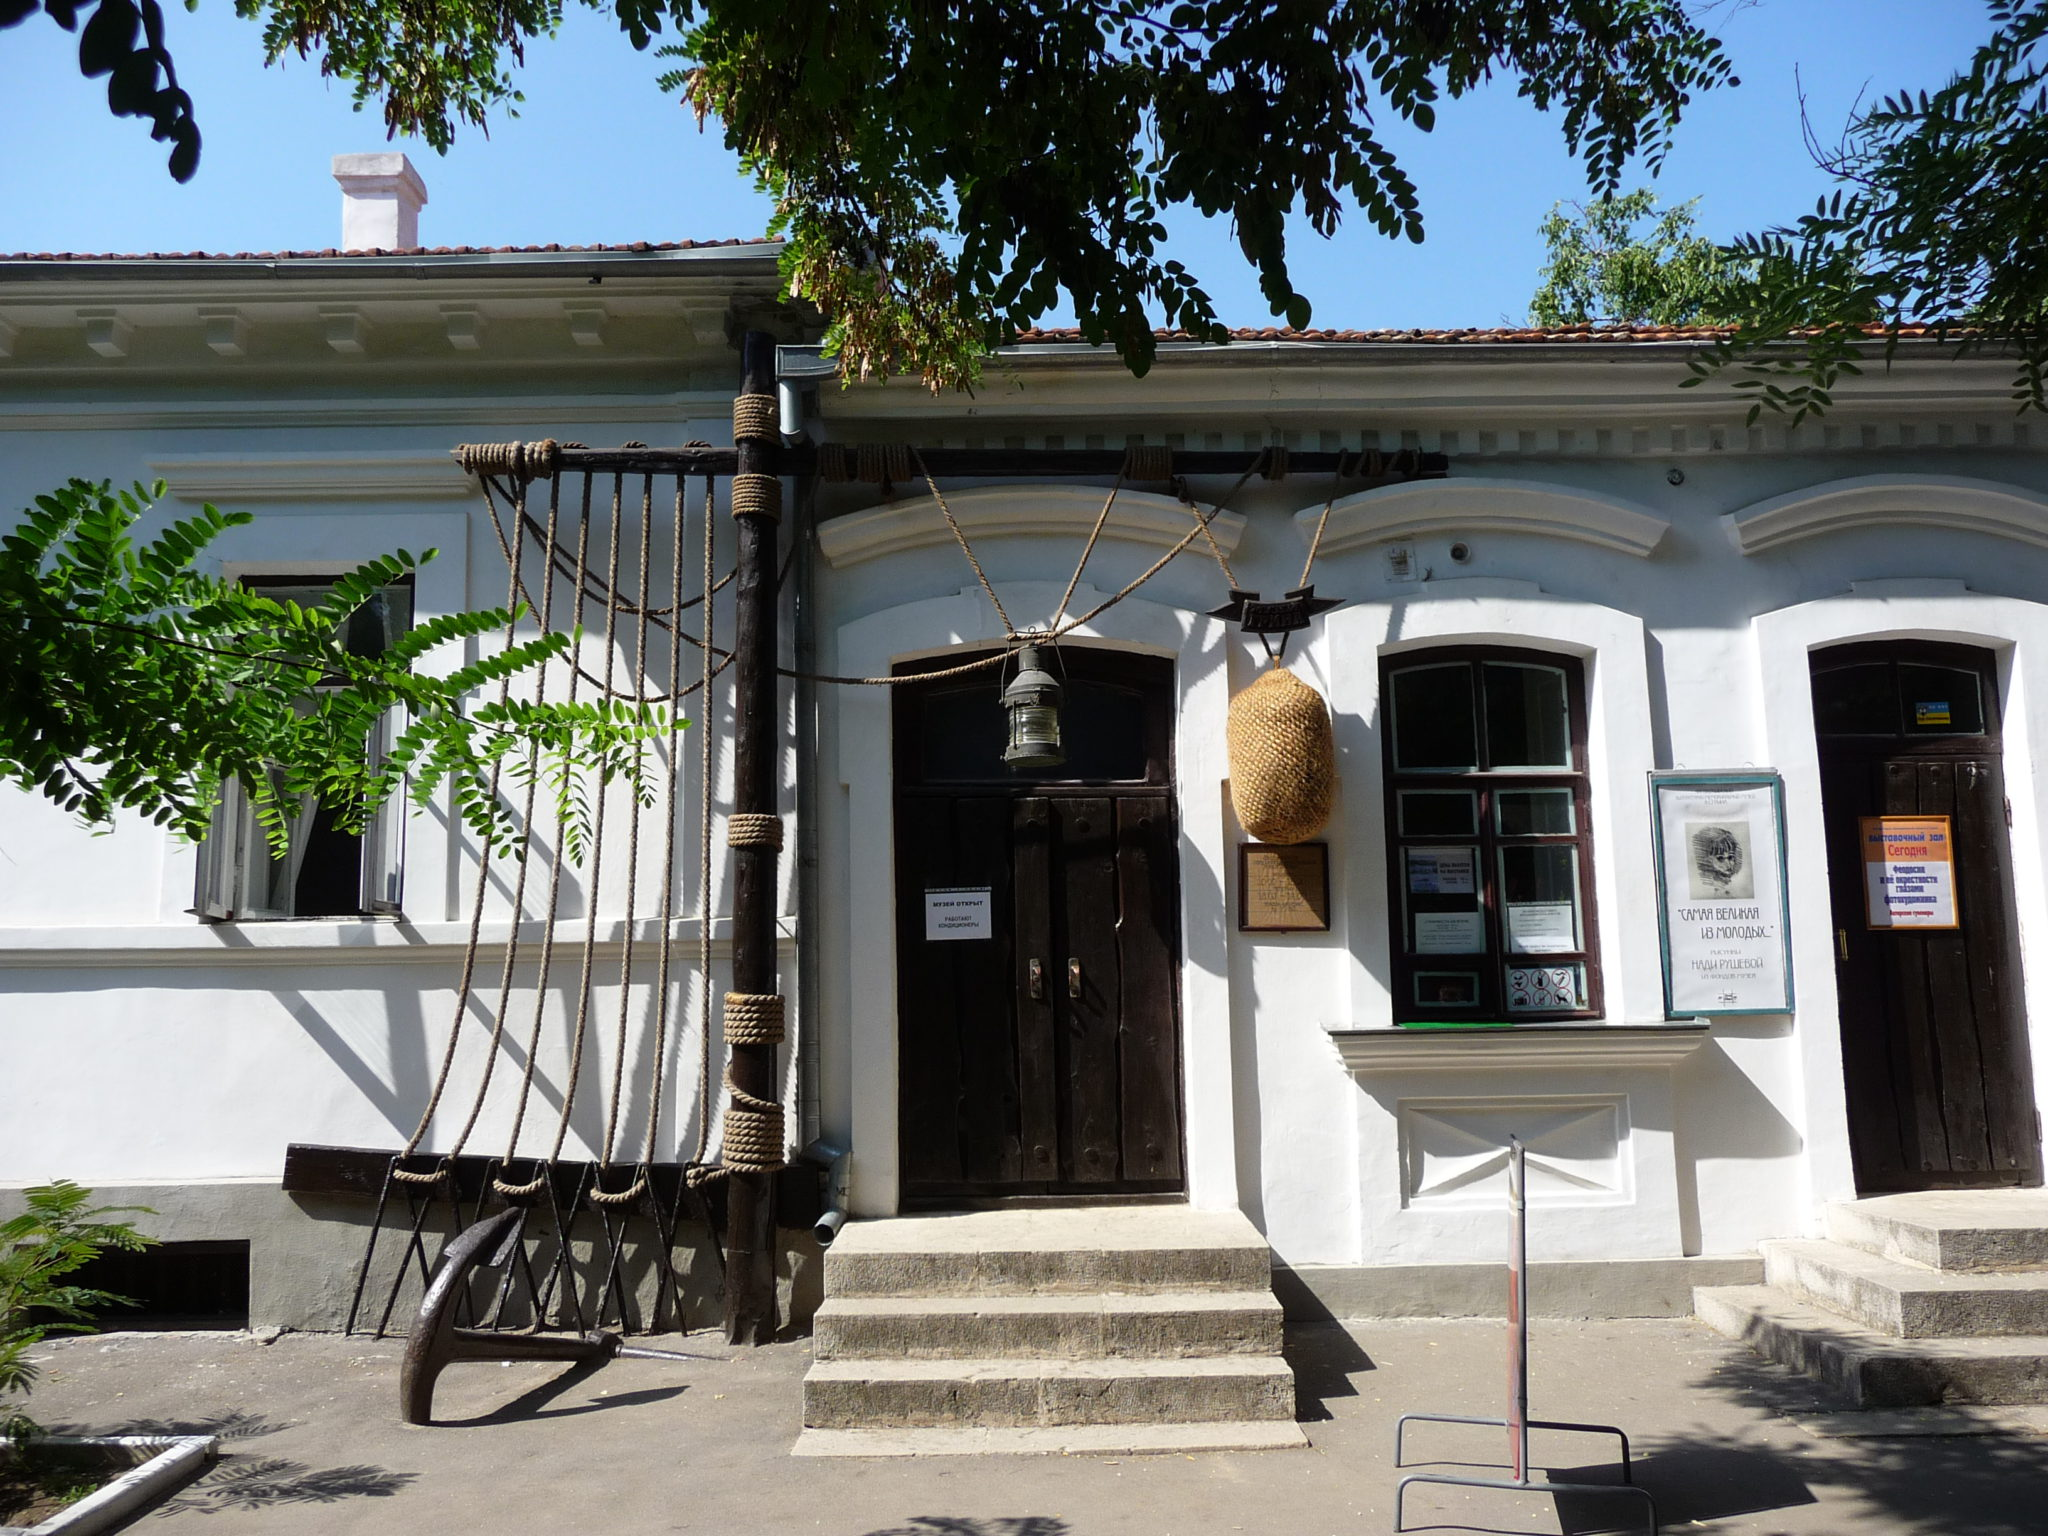 Достопримечательности Феодосии, Музей Грина